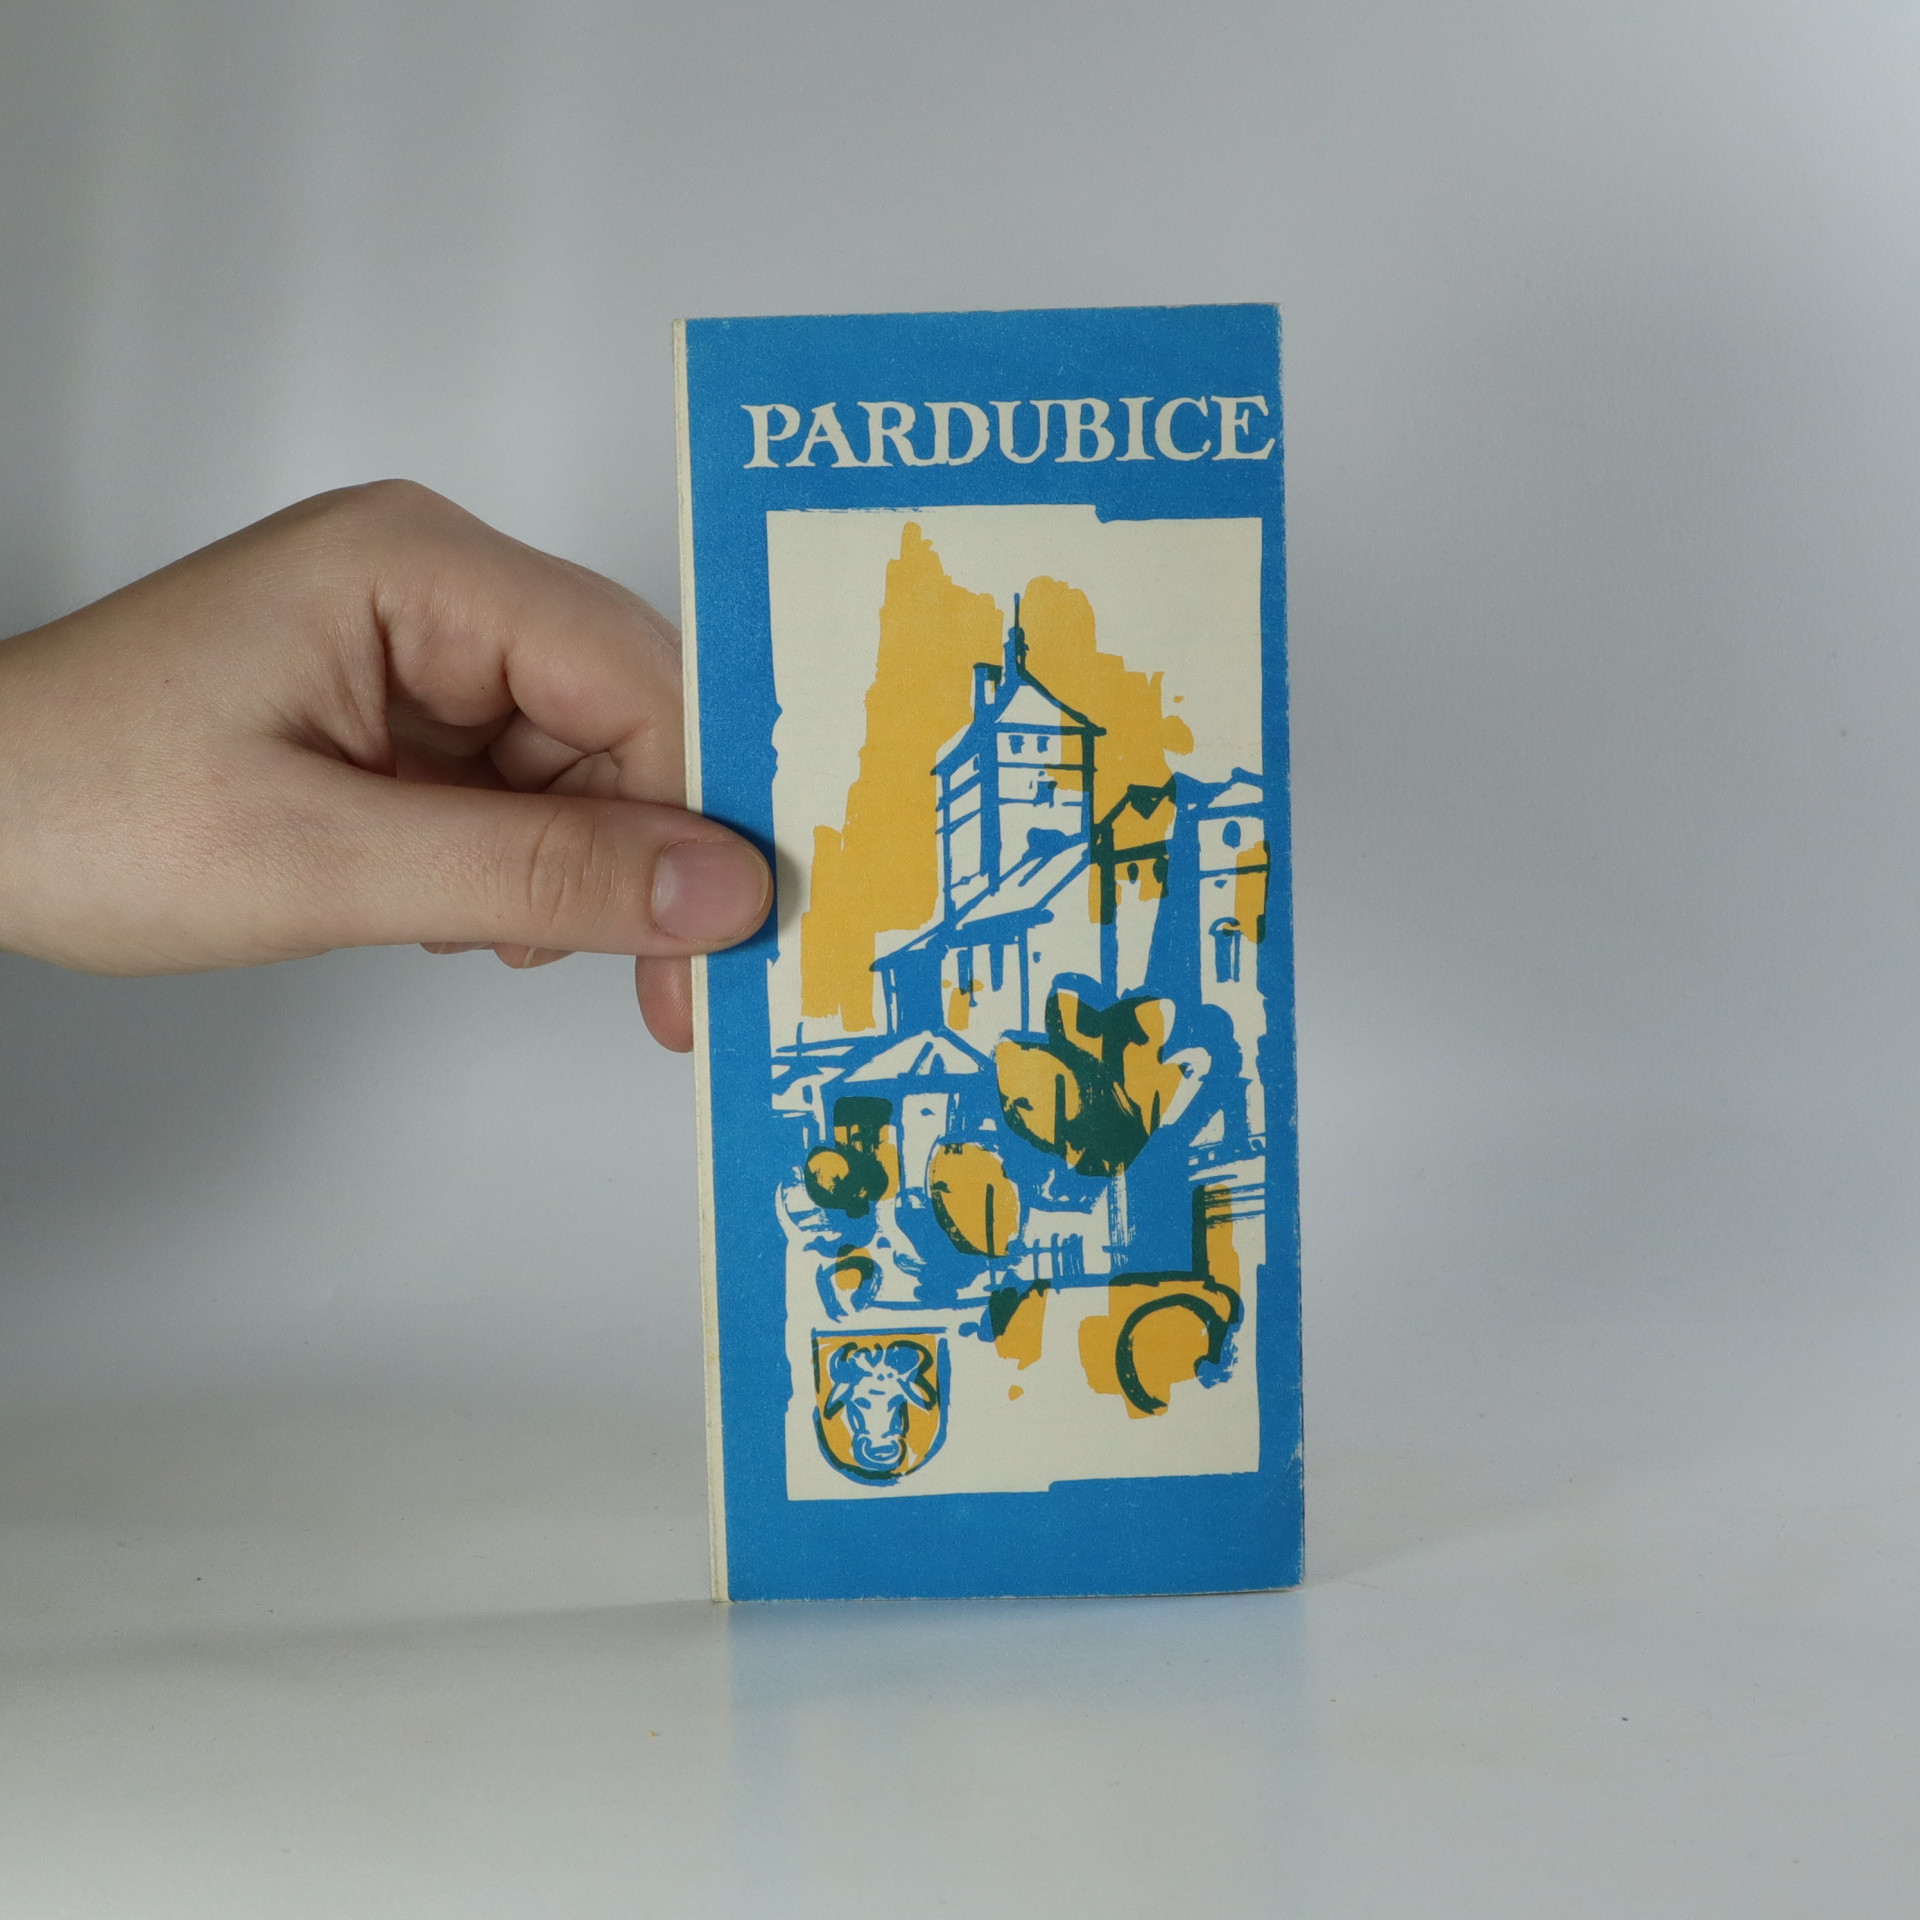 antikvární kniha Pardubice, 1969